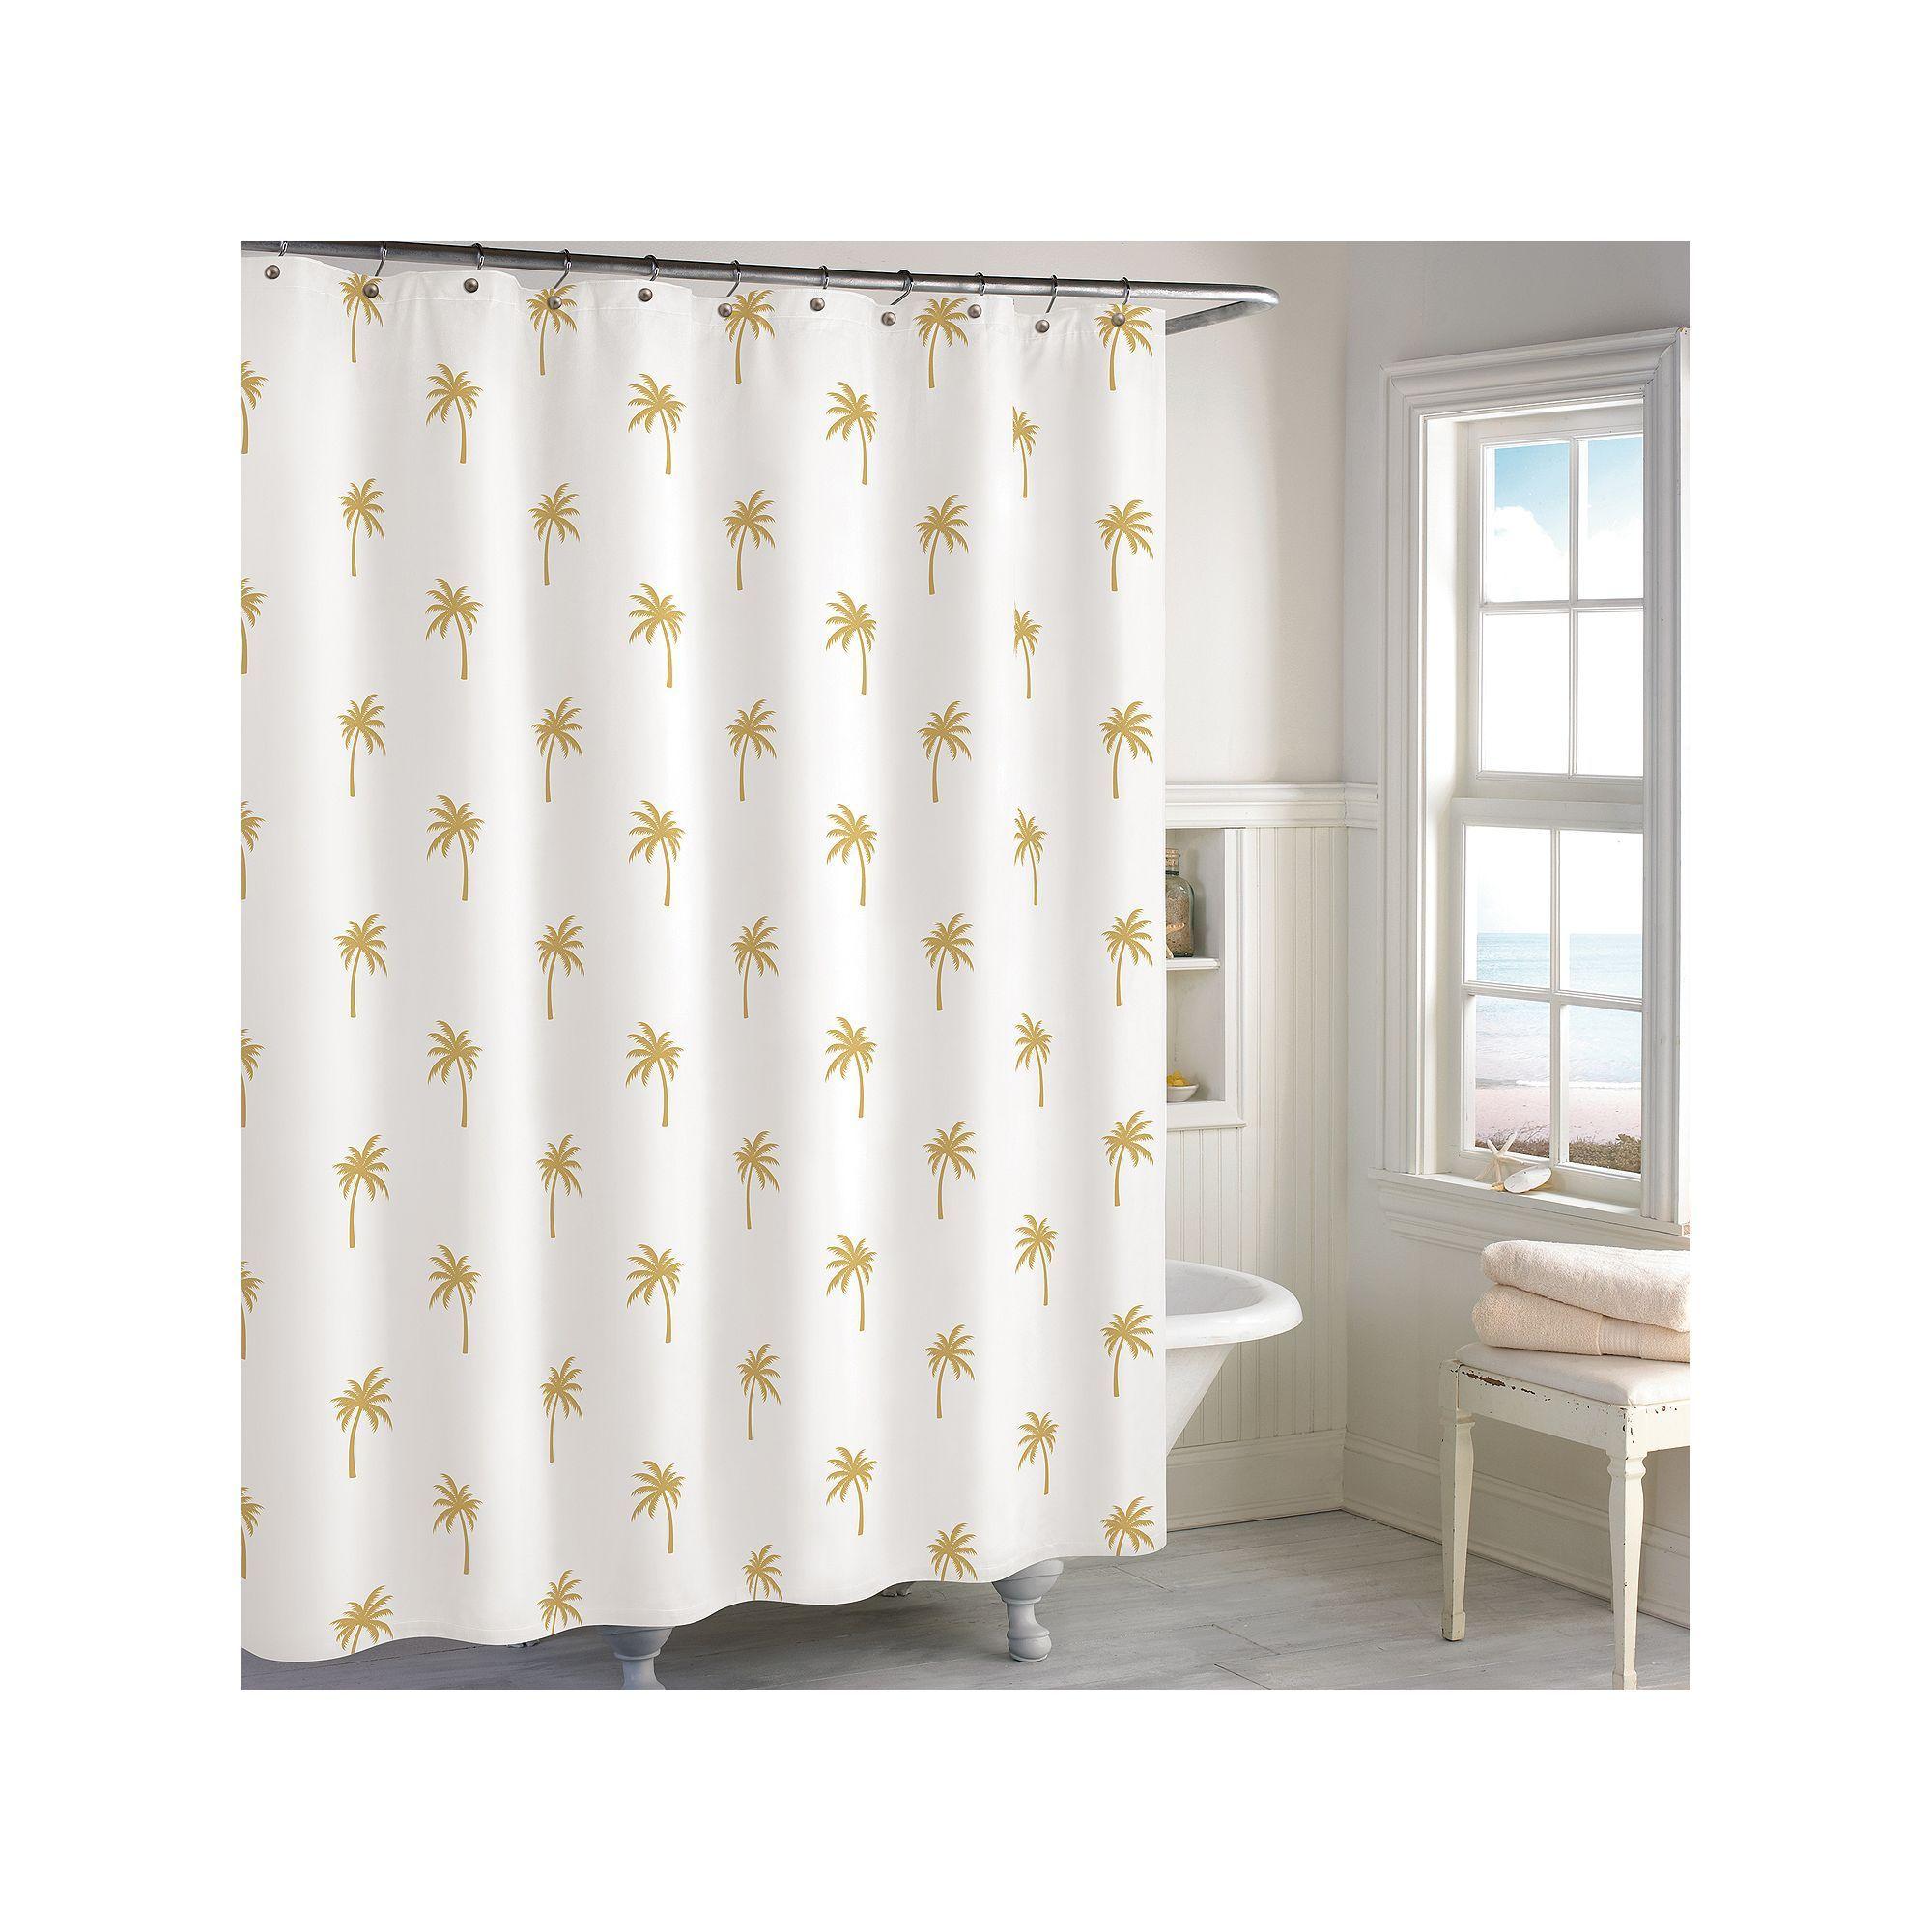 Palm shower curtain - Destinations Golden Palm Tree Shower Curtain Yellow